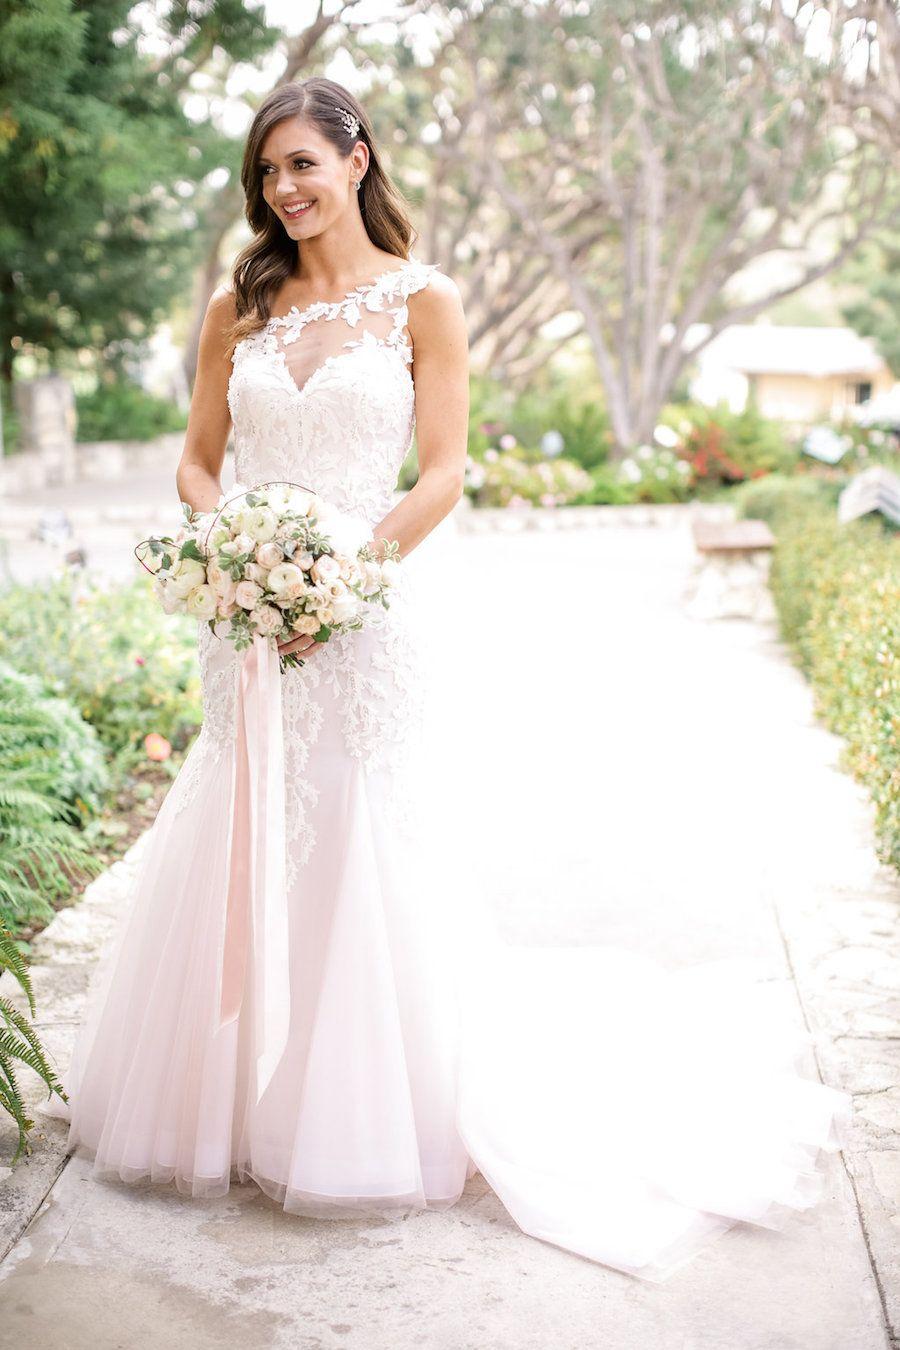 Desiree Hartsock Chris Siegfried S Bachelorette Wedding Greek Wedding Dresses Lace Shoulder Wedding Dress Wedding Dress Inspiration